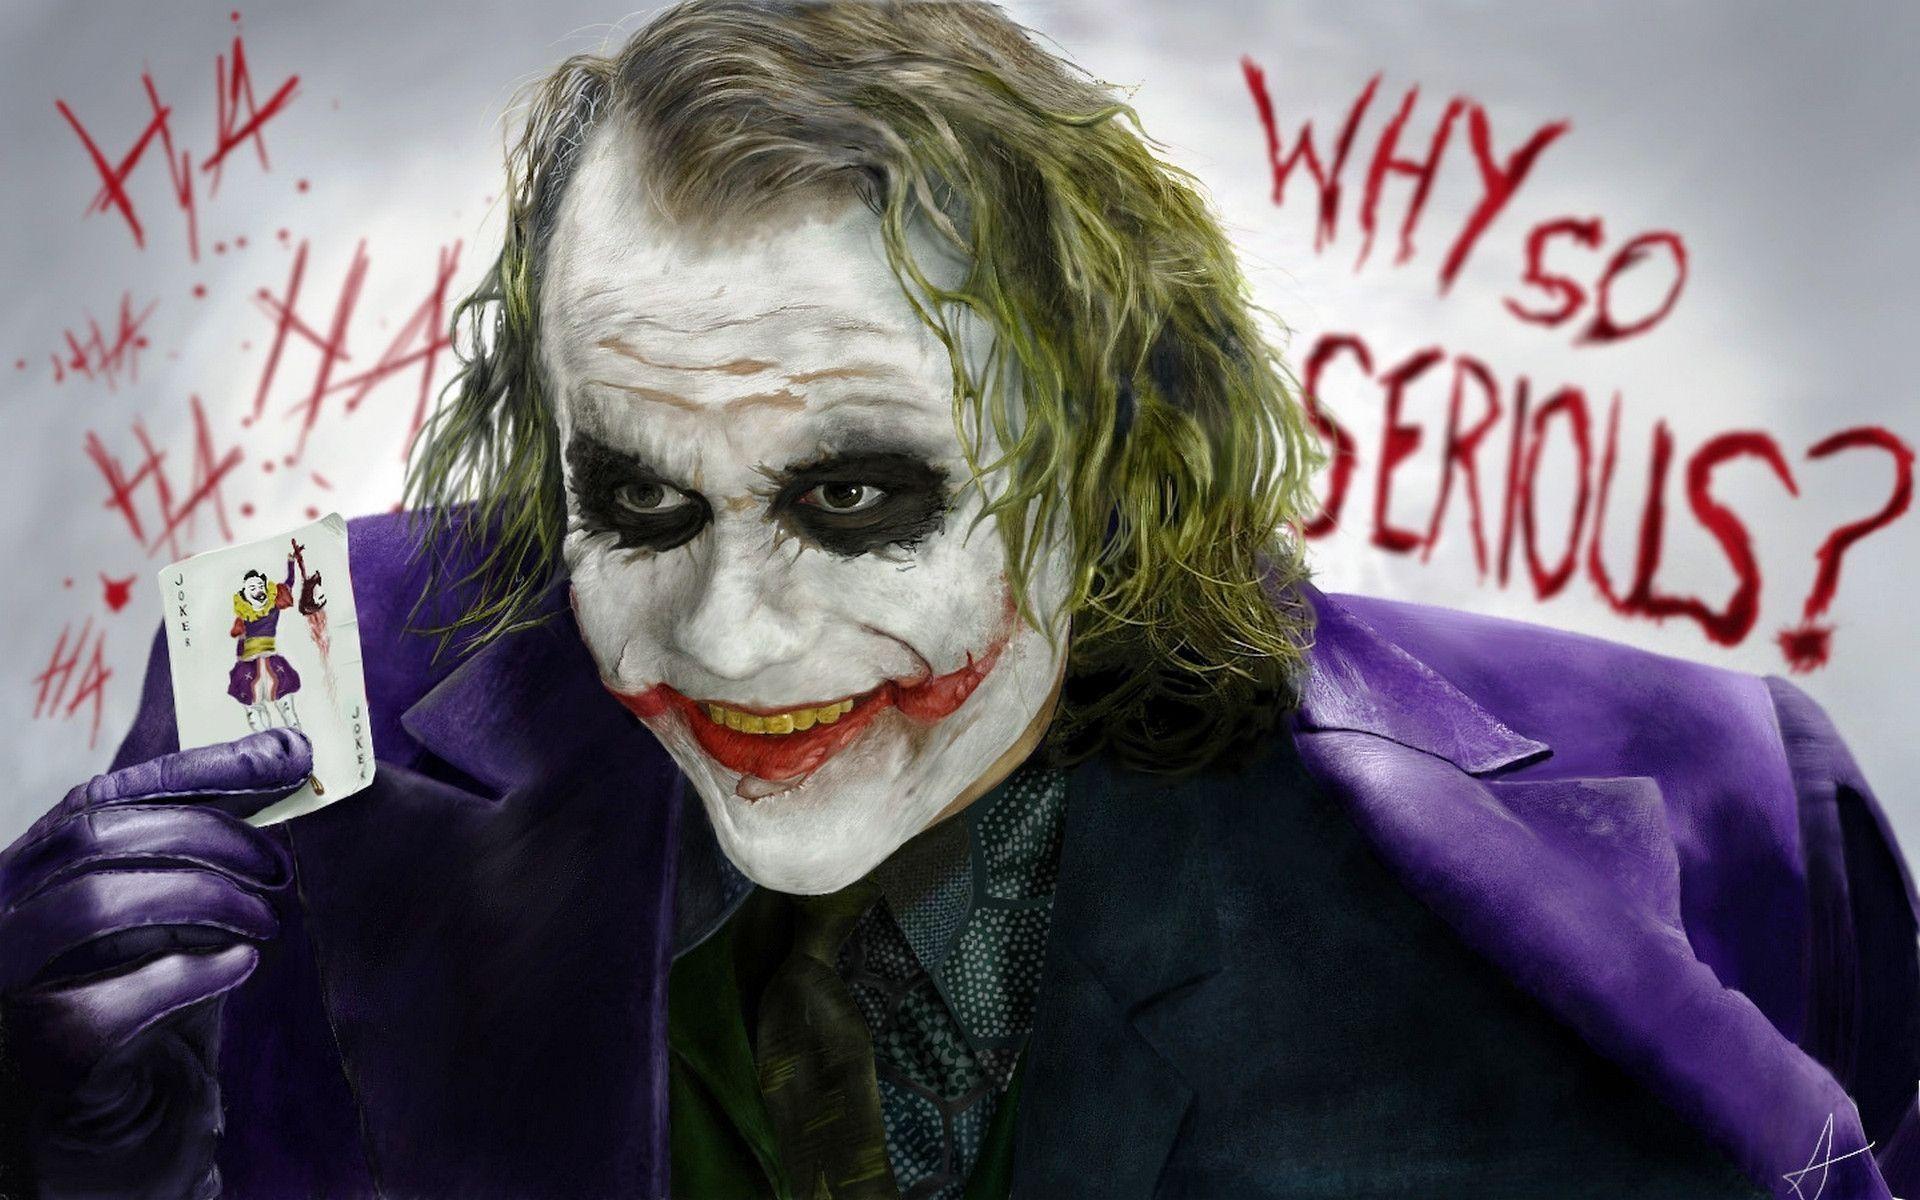 Wallpaper-Joker-Heath-Ledger-Smiling Joker wallpaper HD free .